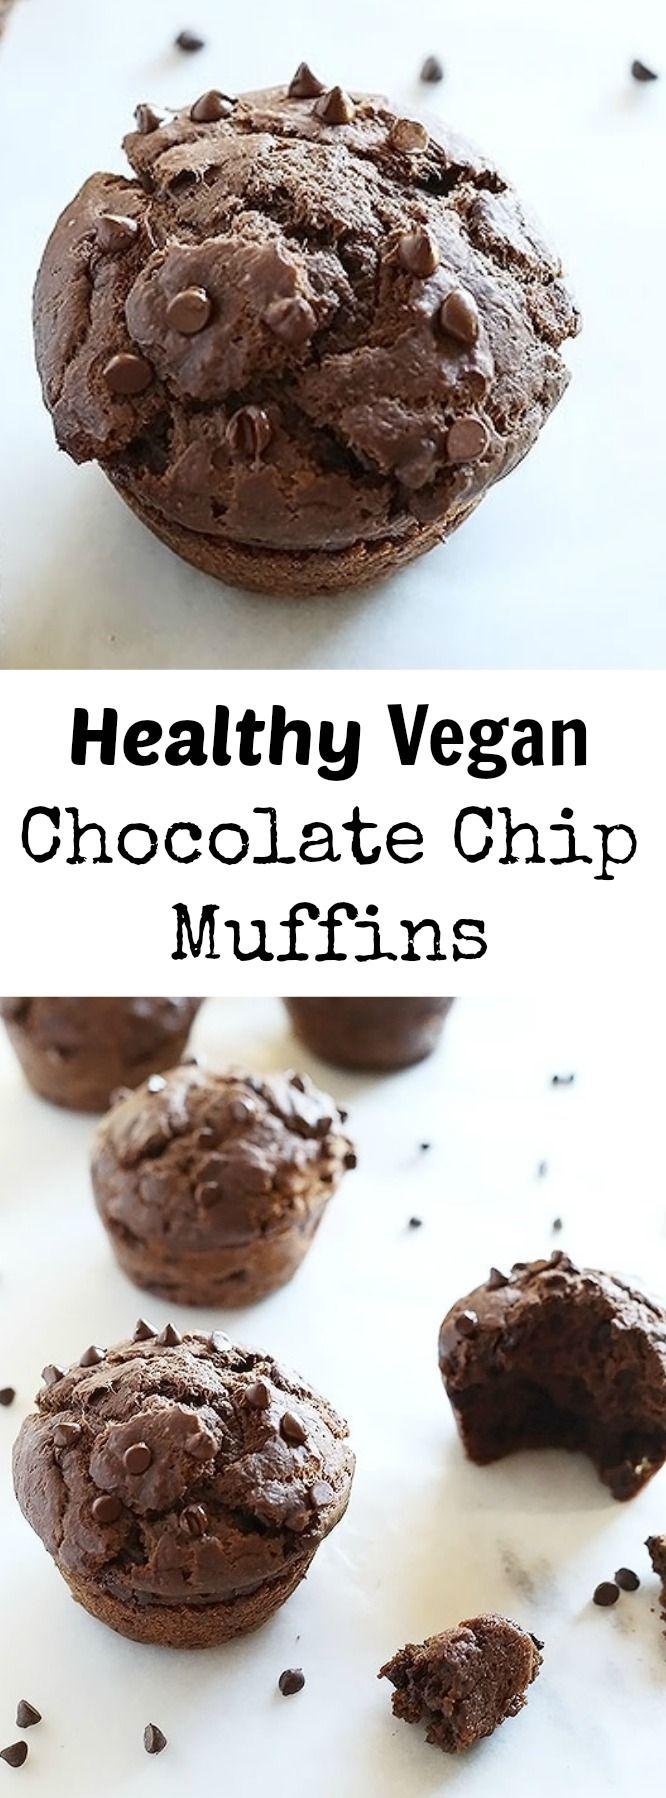 Healthy Vegan Chocolate Chip Muffins